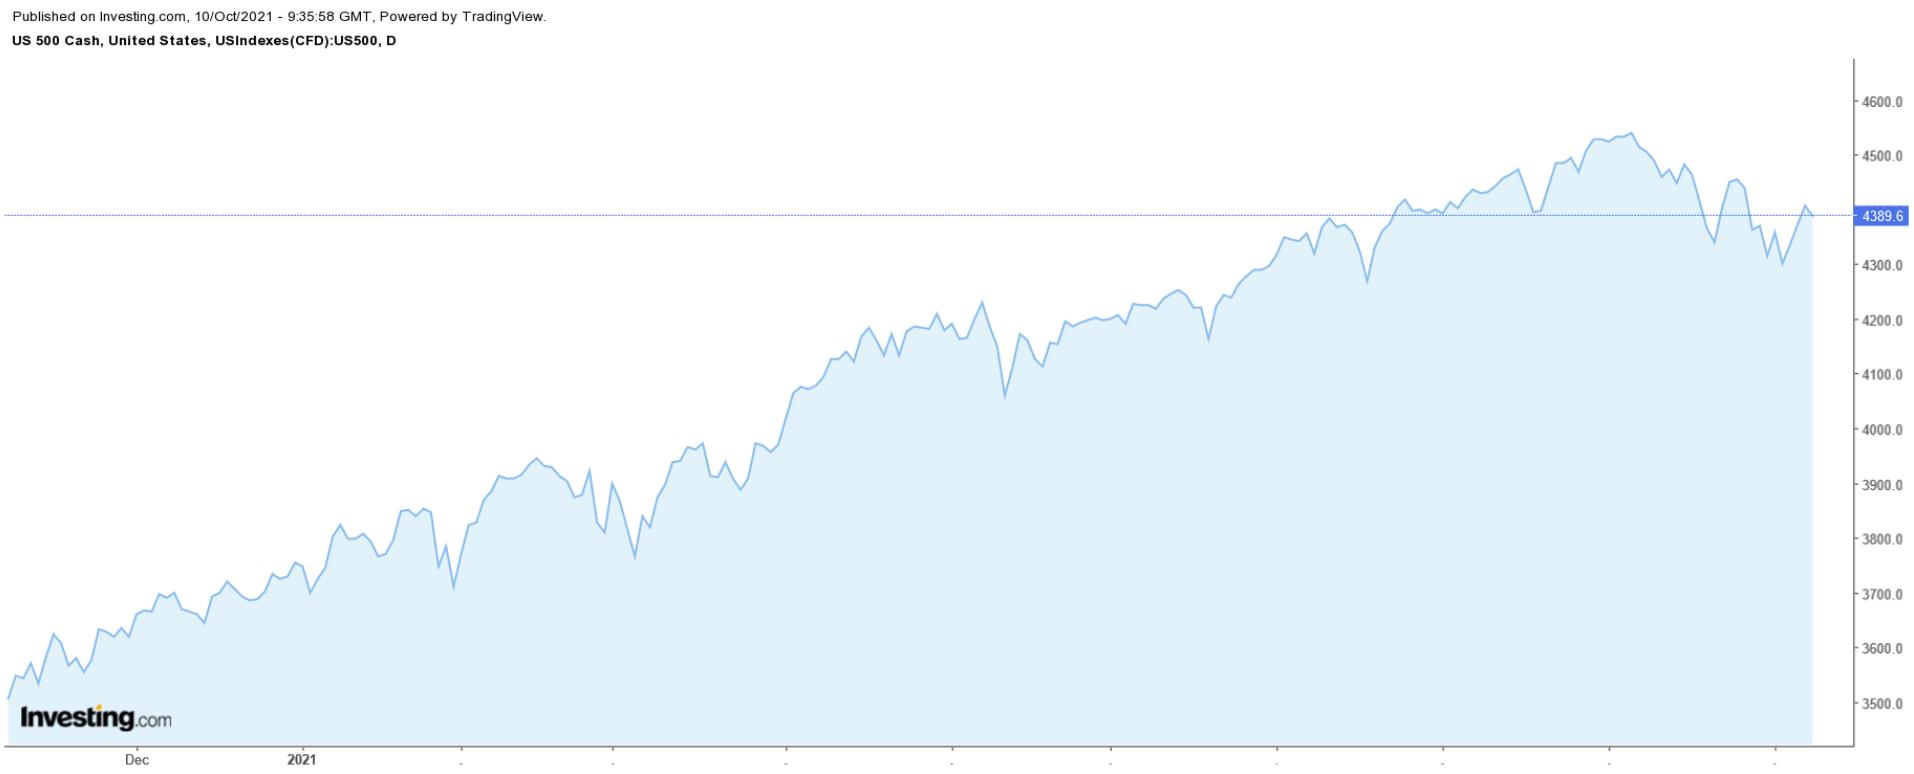 S&P 500 Grafiek